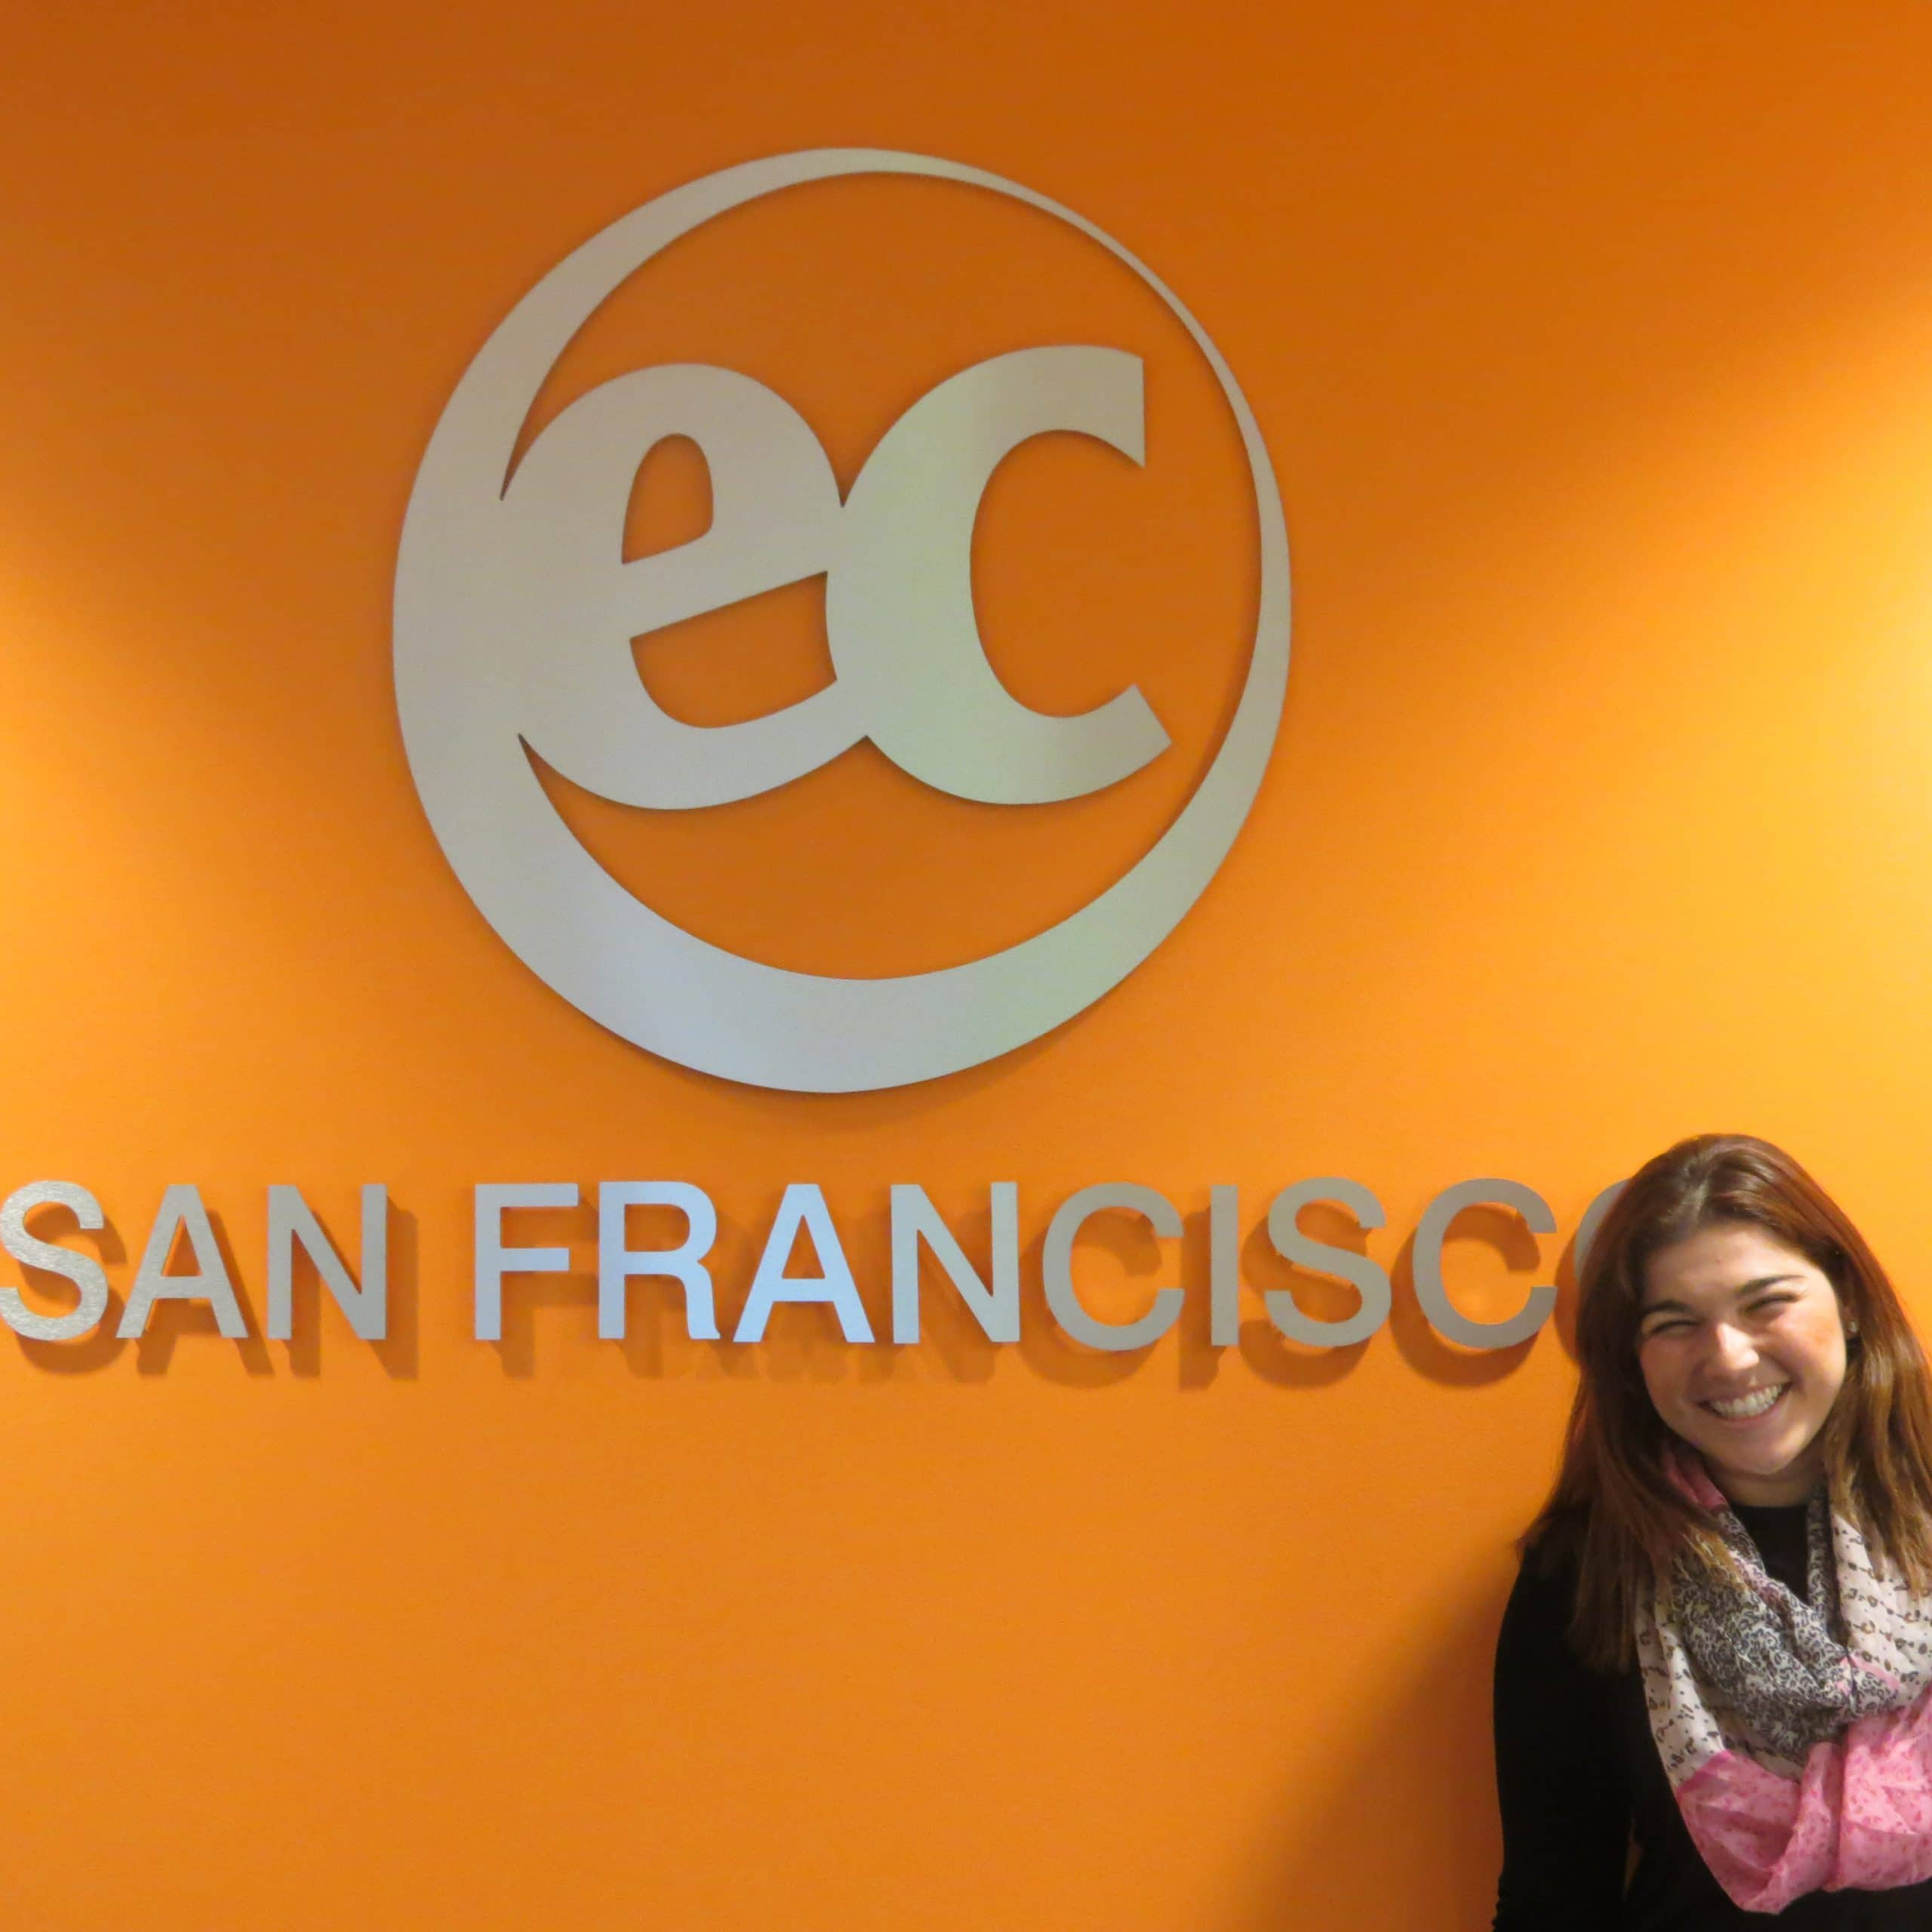 EC San Francisco  -  you can't beat it.